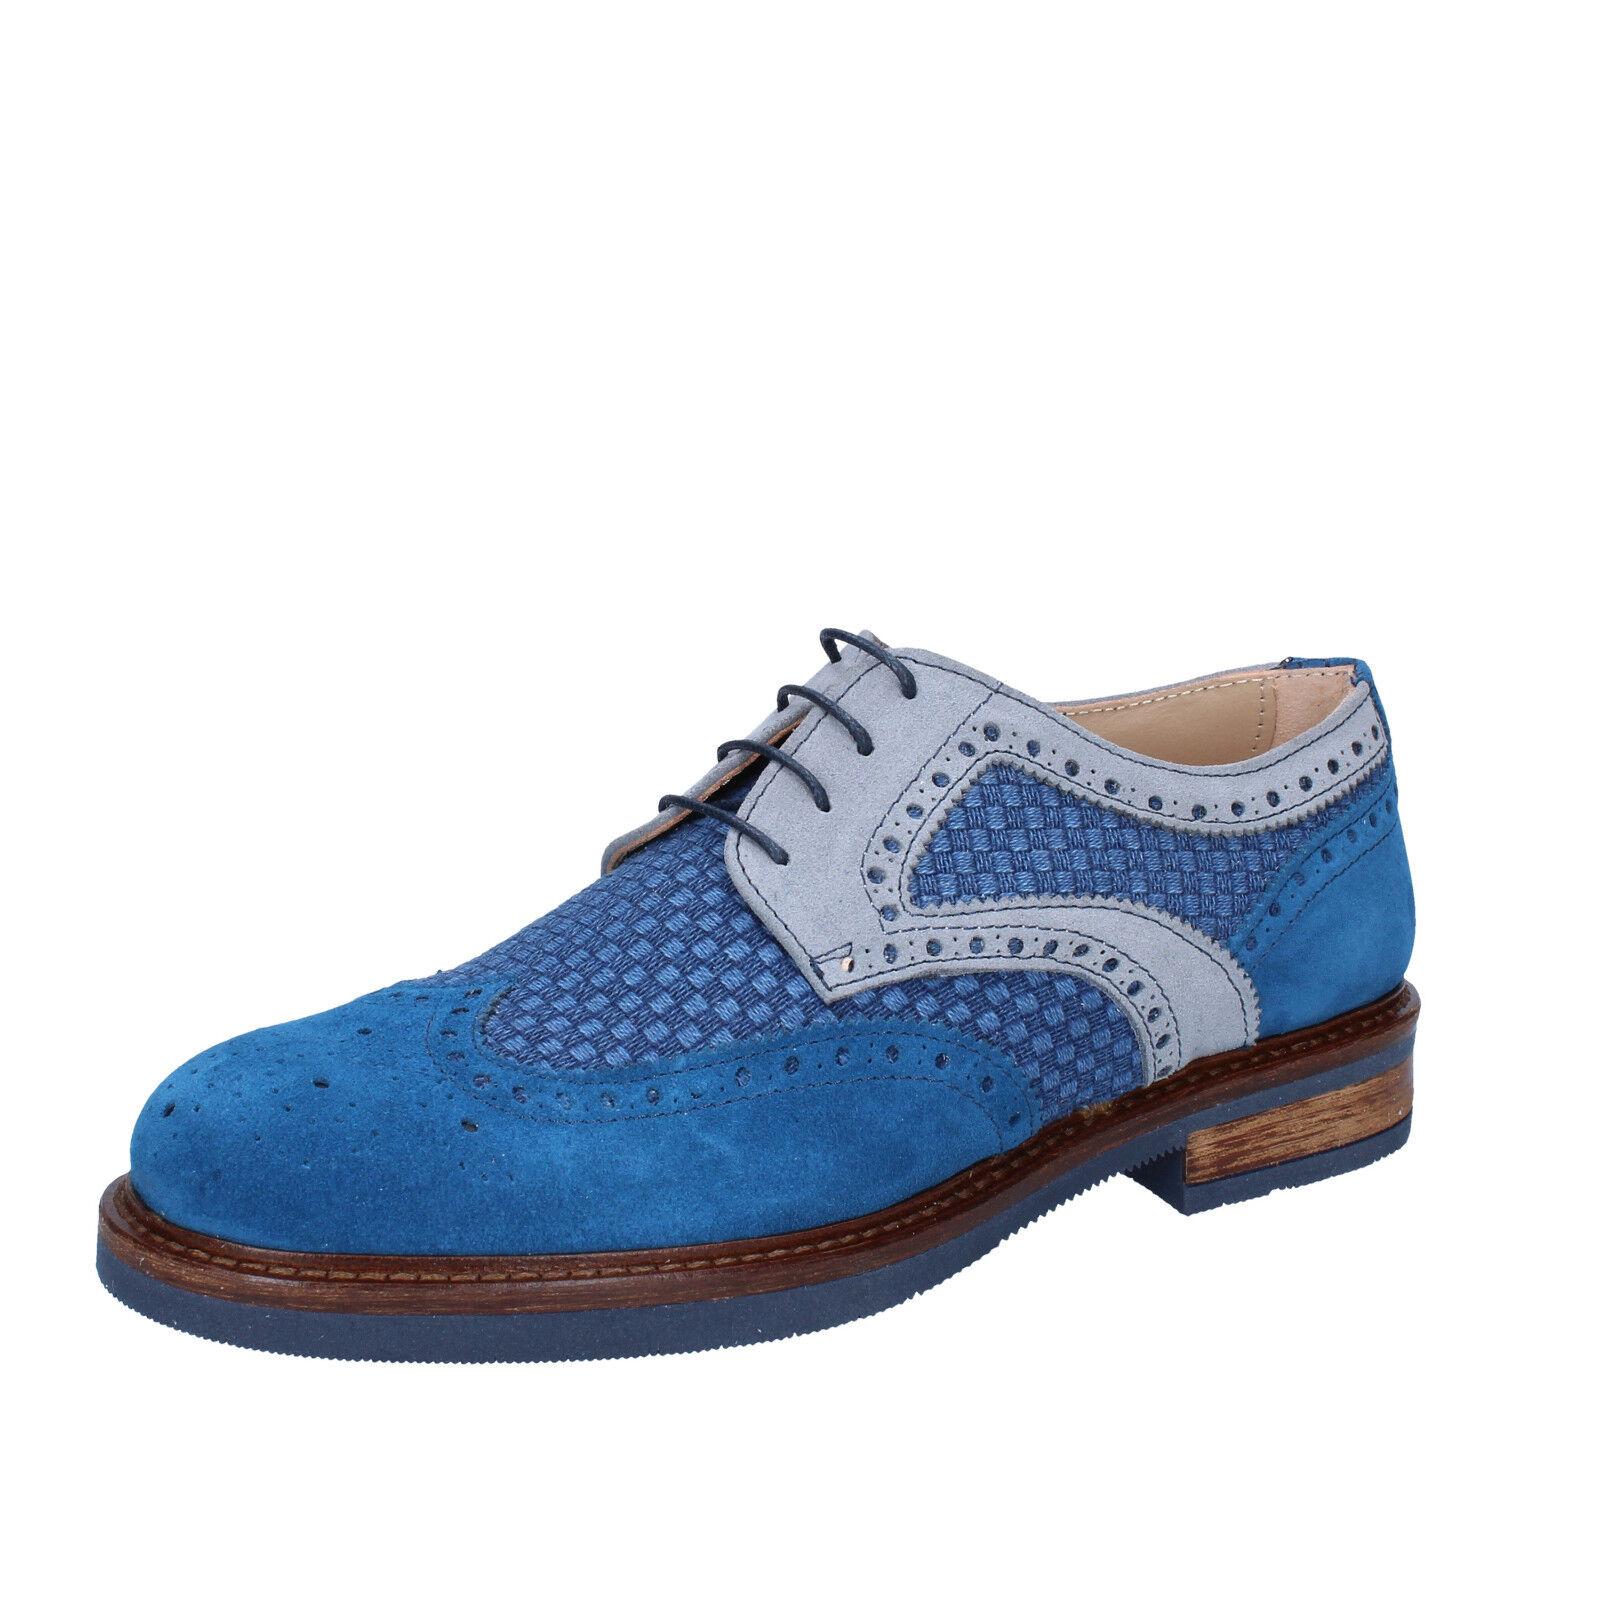 Herren schuhe FDF SHOES 45 EU elegante blau grau wildleder textil BZ348-G